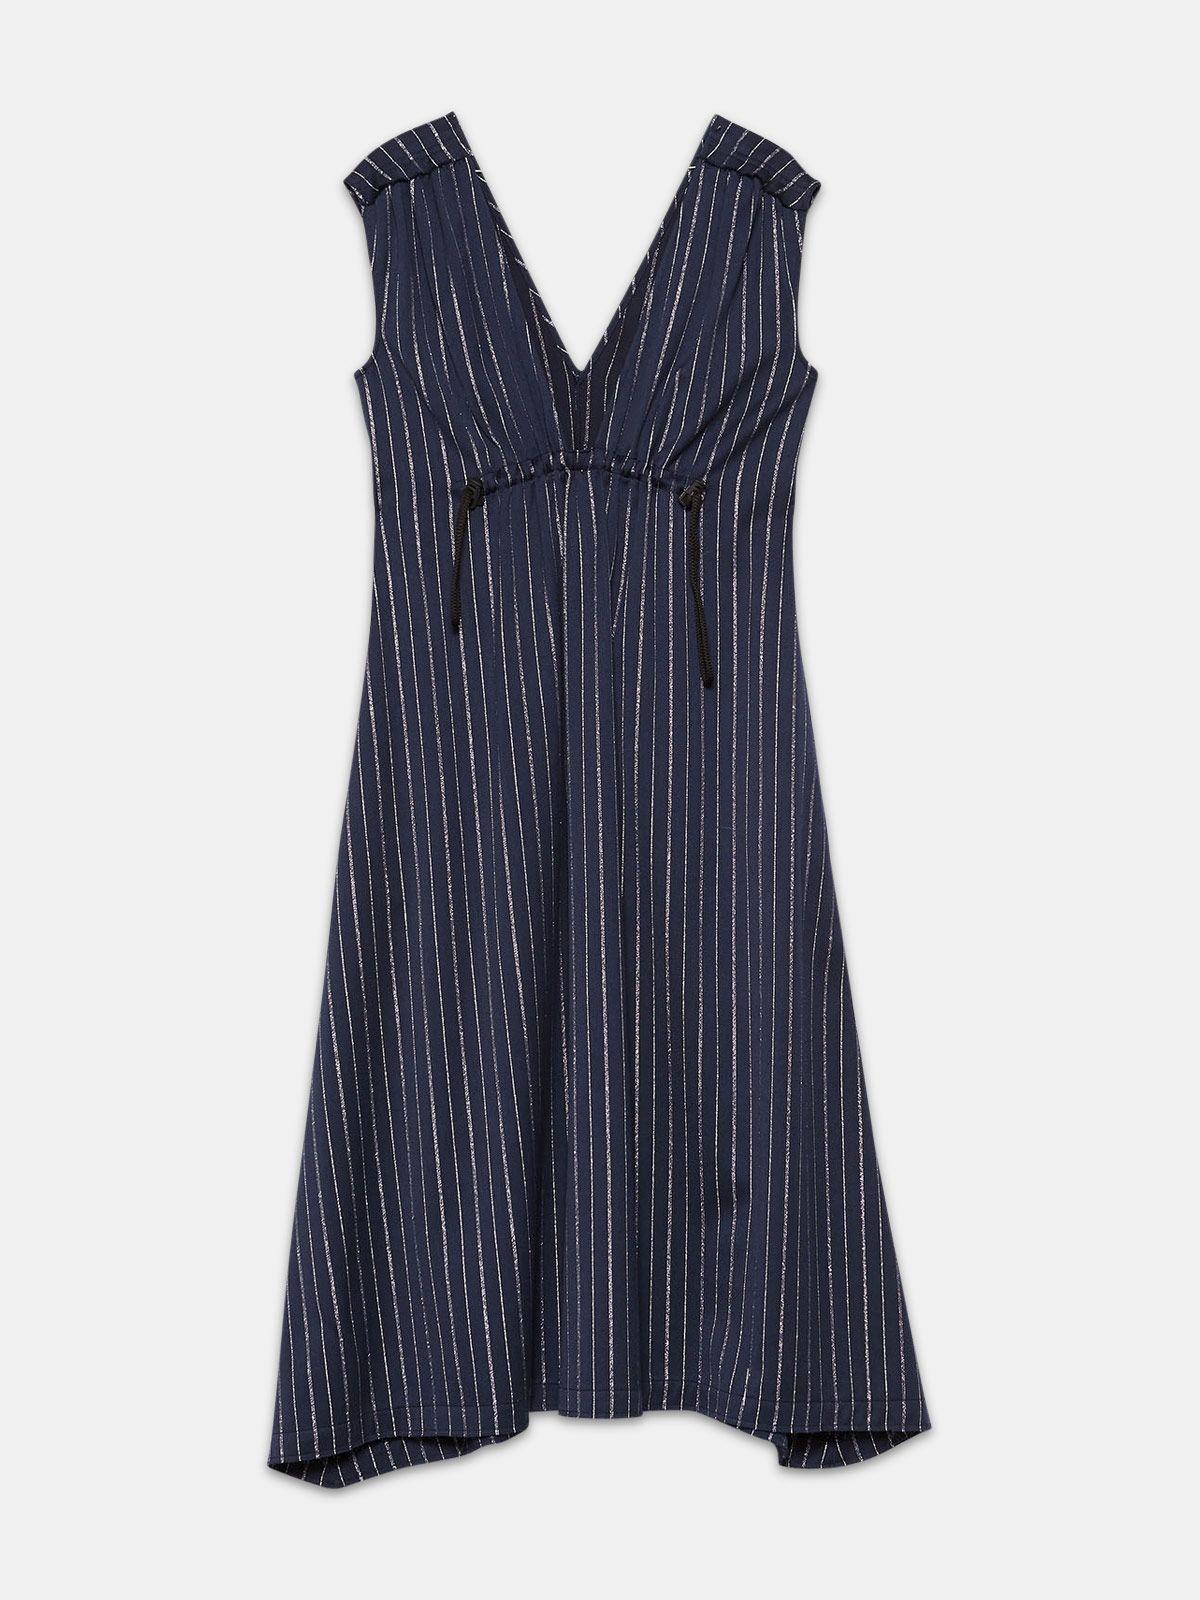 Golden Goose - Sleeveless Sagiso dress in wool blend with pinstripe in